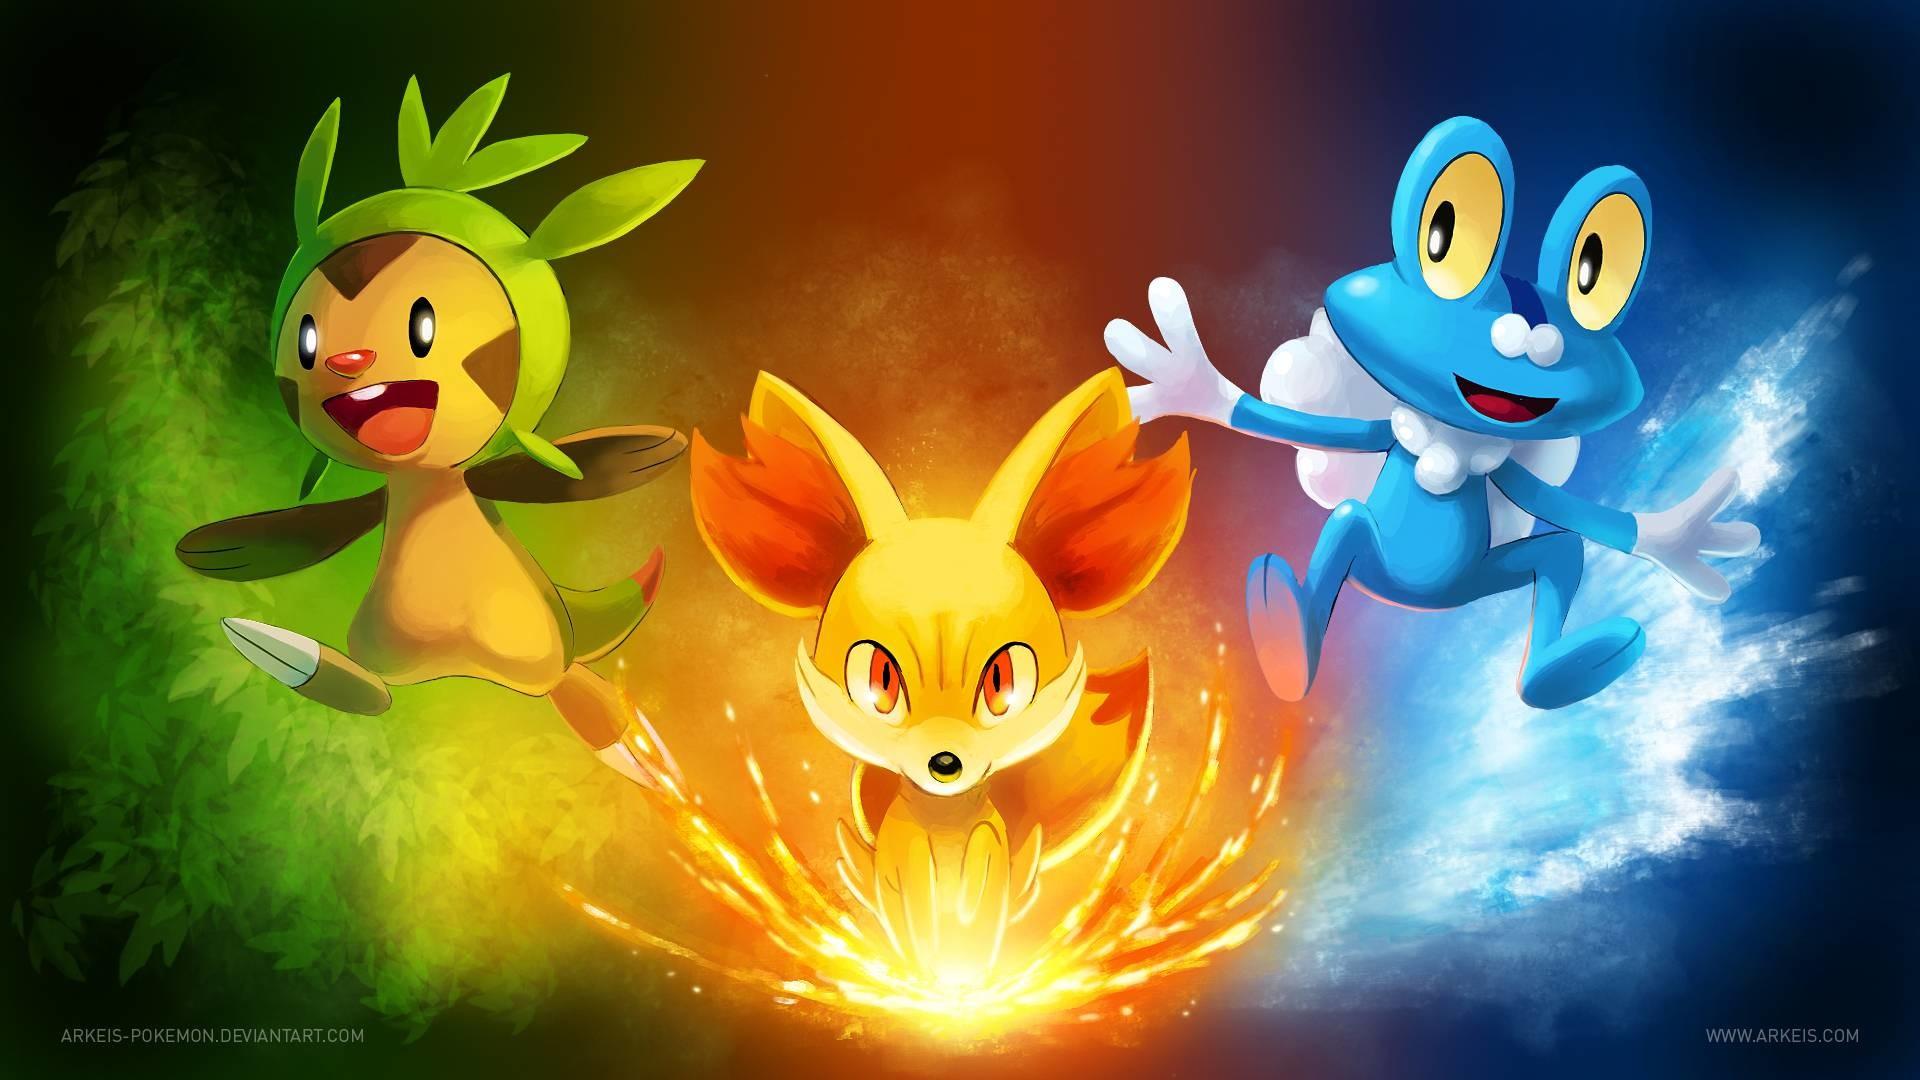 Cute Pokemon Wallpaper High Quality Resolution